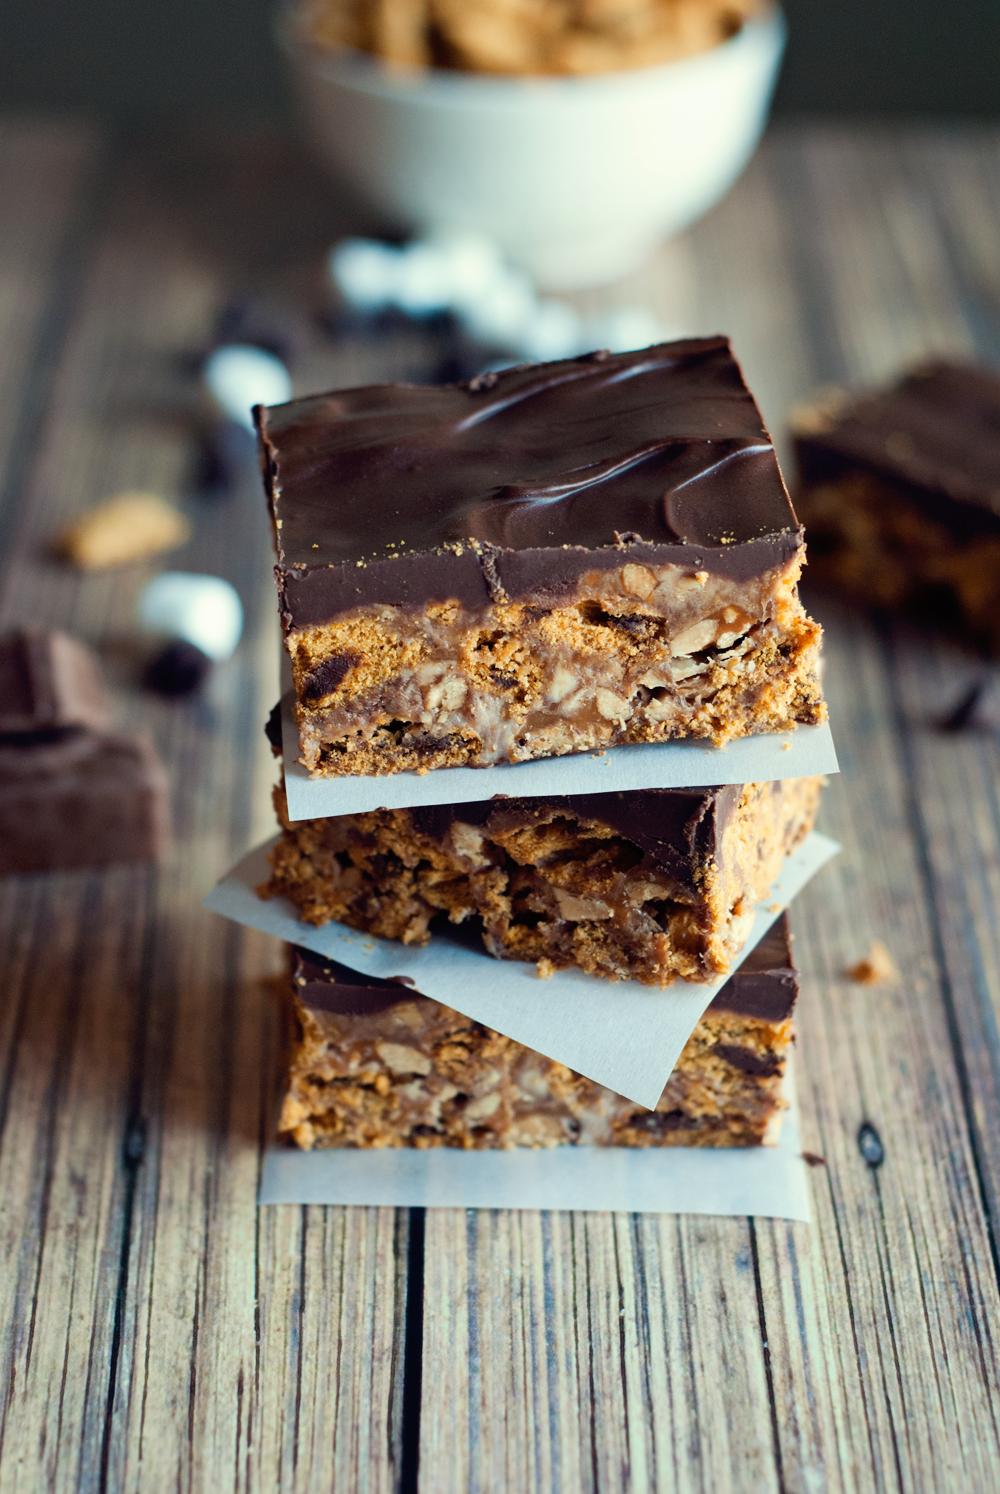 Snickers Cereal Bars Dessert Recipe